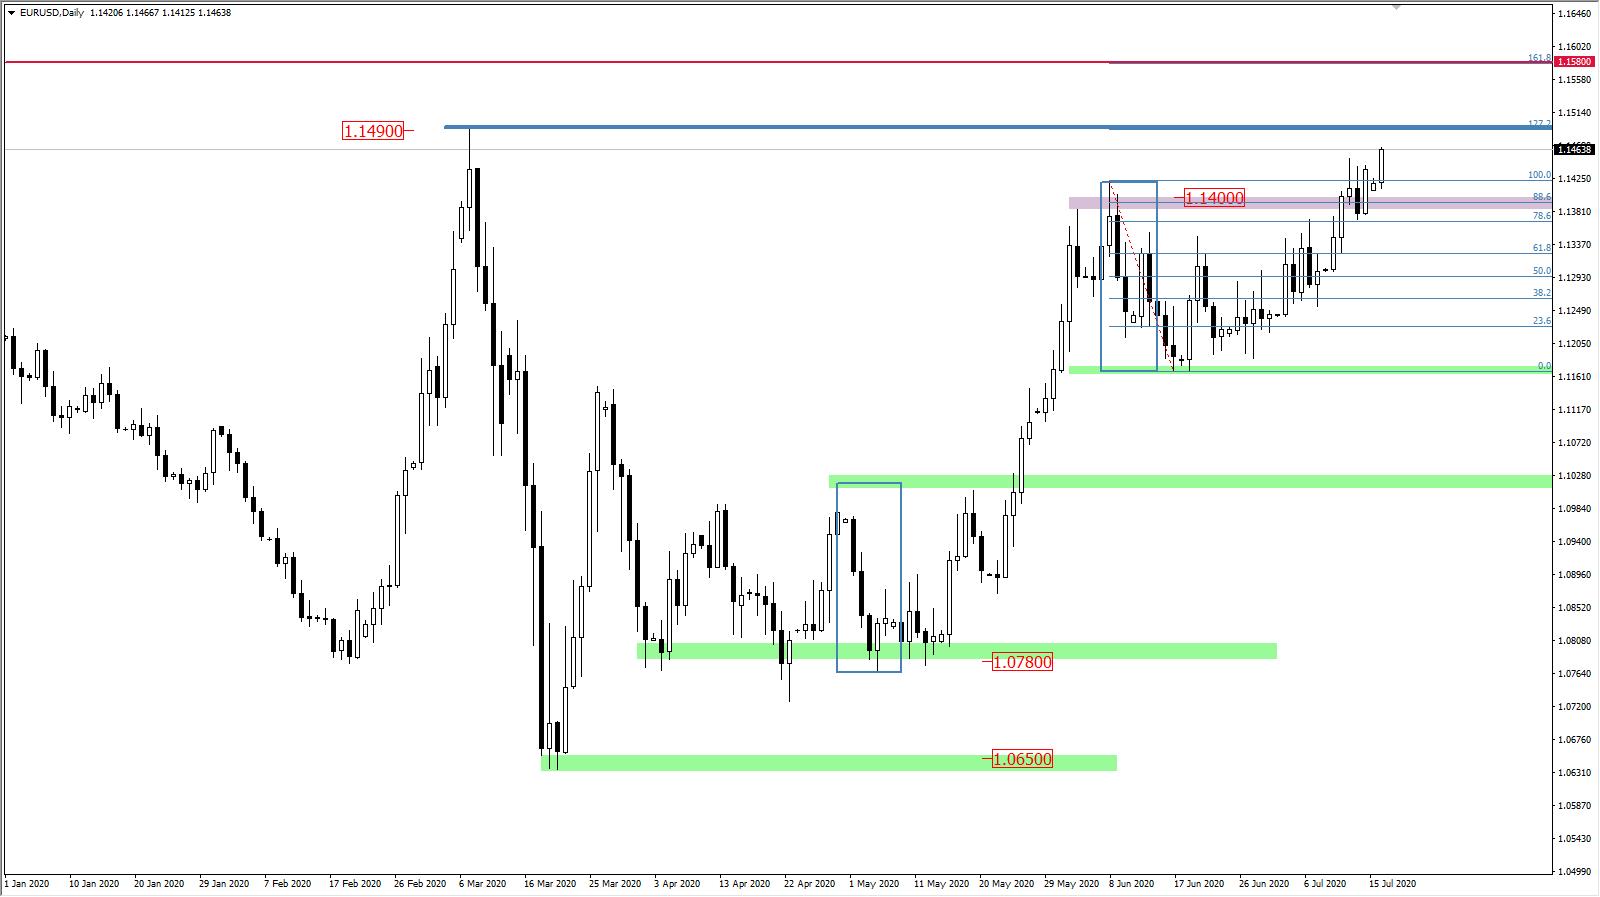 EURUSD wykres